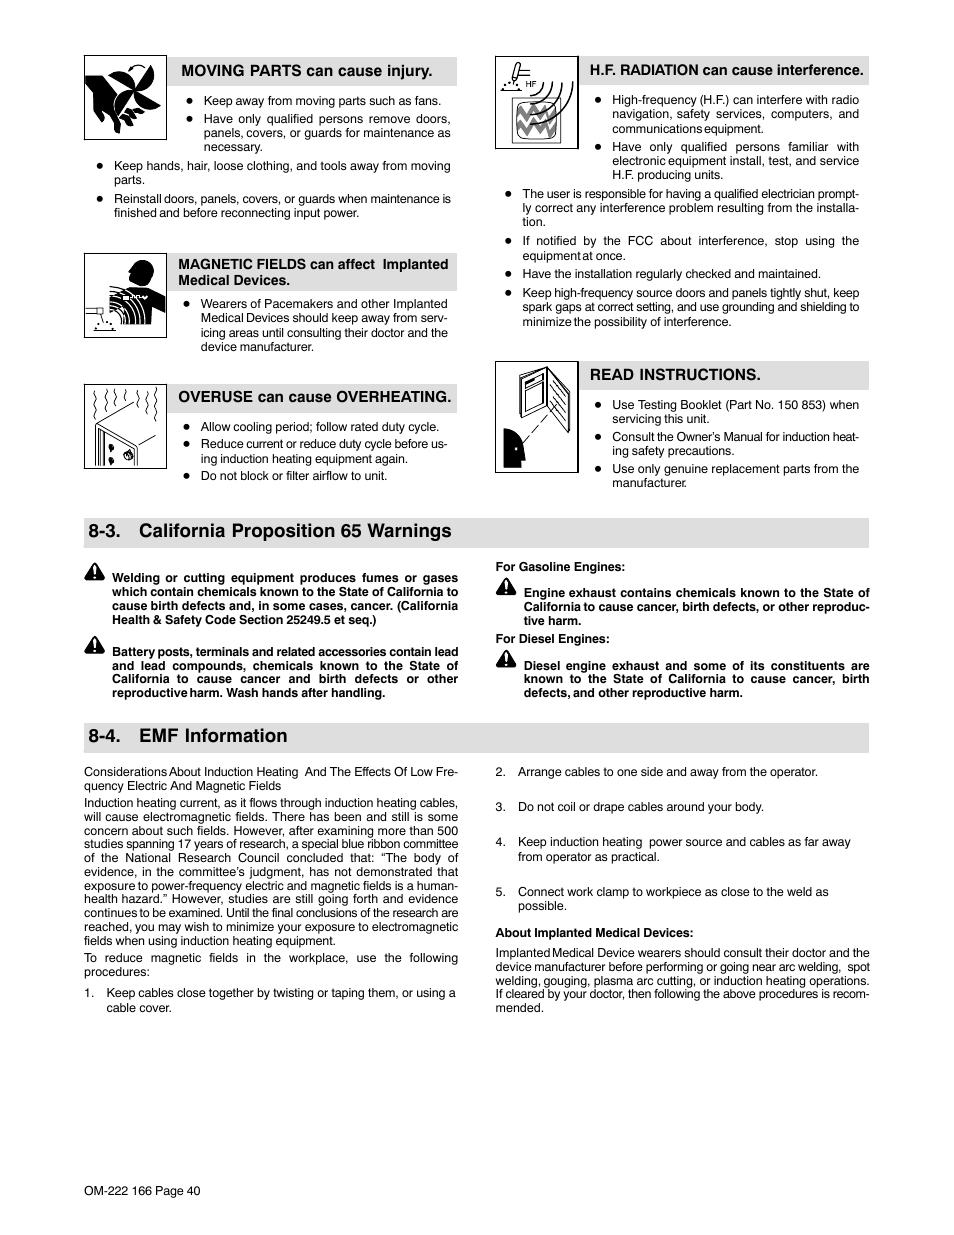 3  california proposition 65 warnings, 4  emf information | Miller